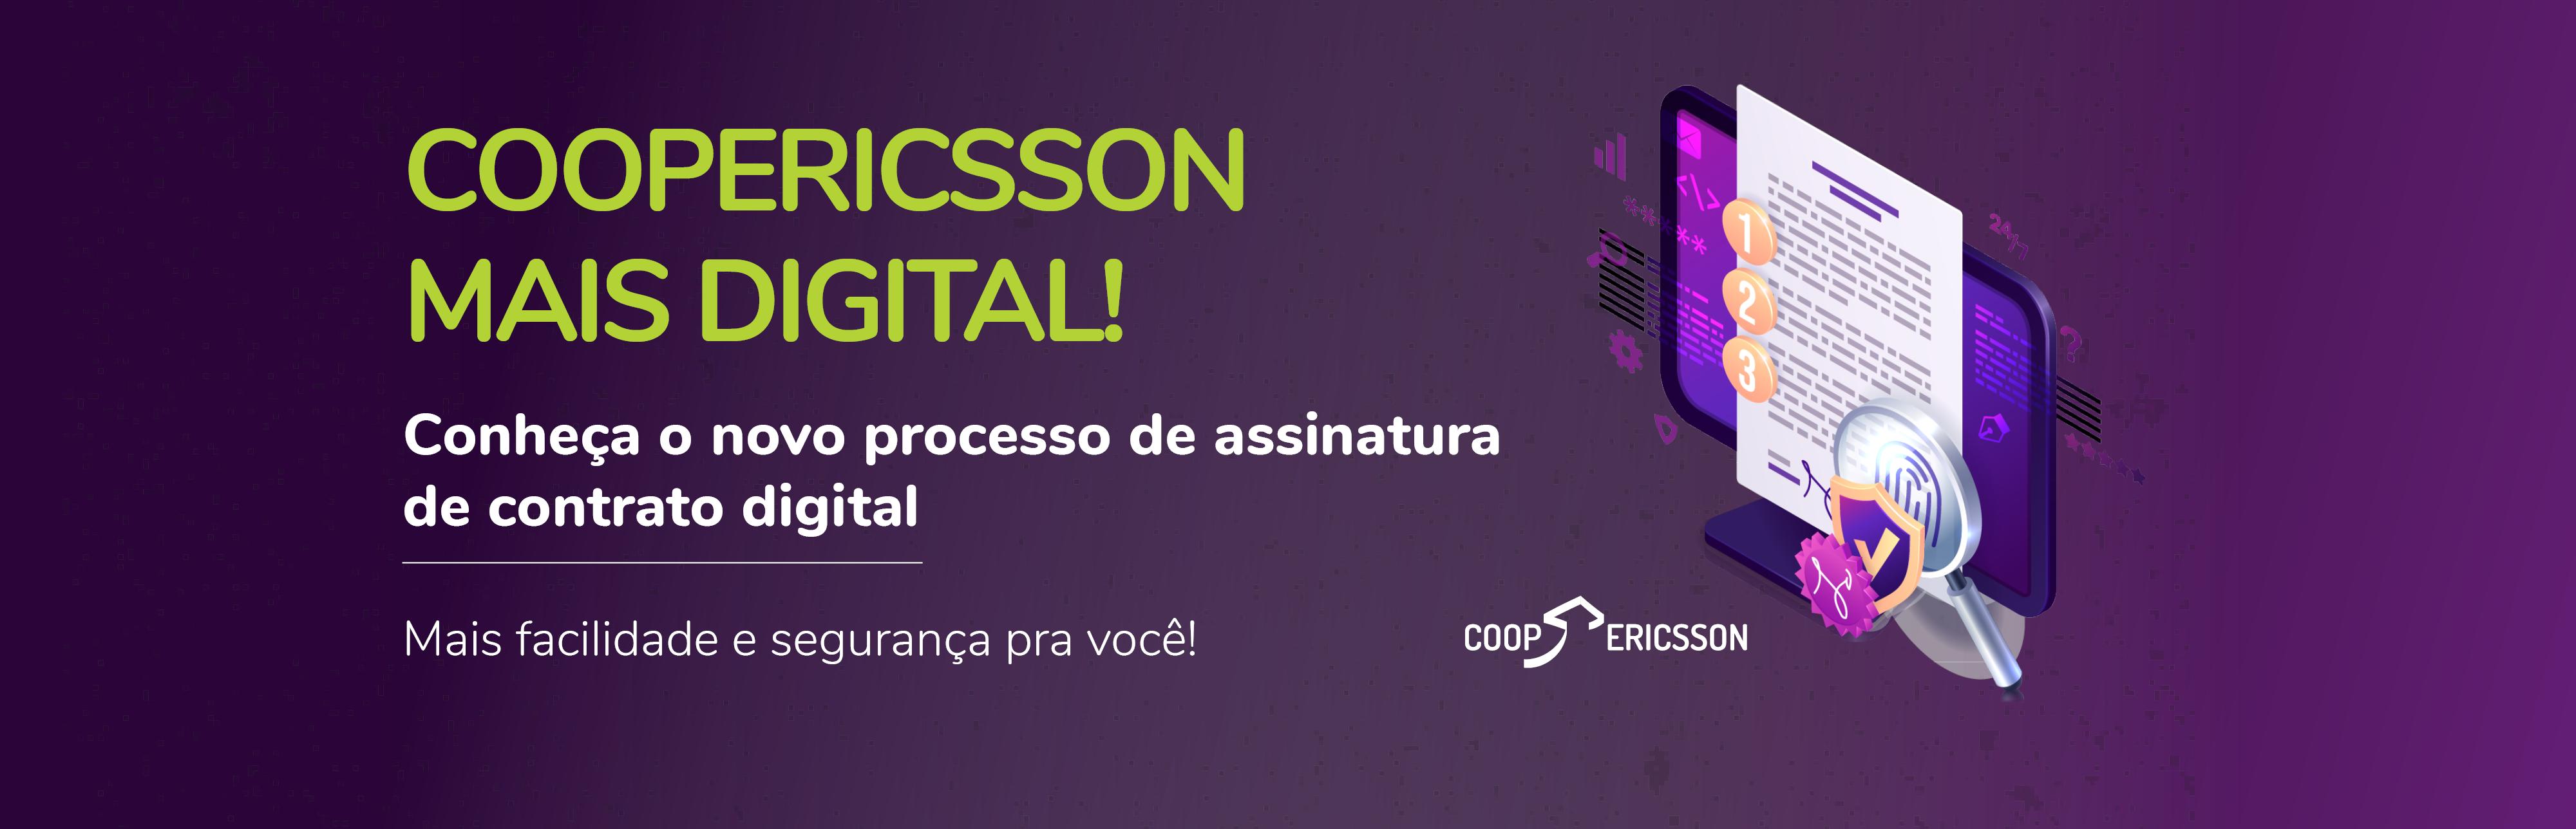 CoopEricsson adere a assinatura digital de contratos